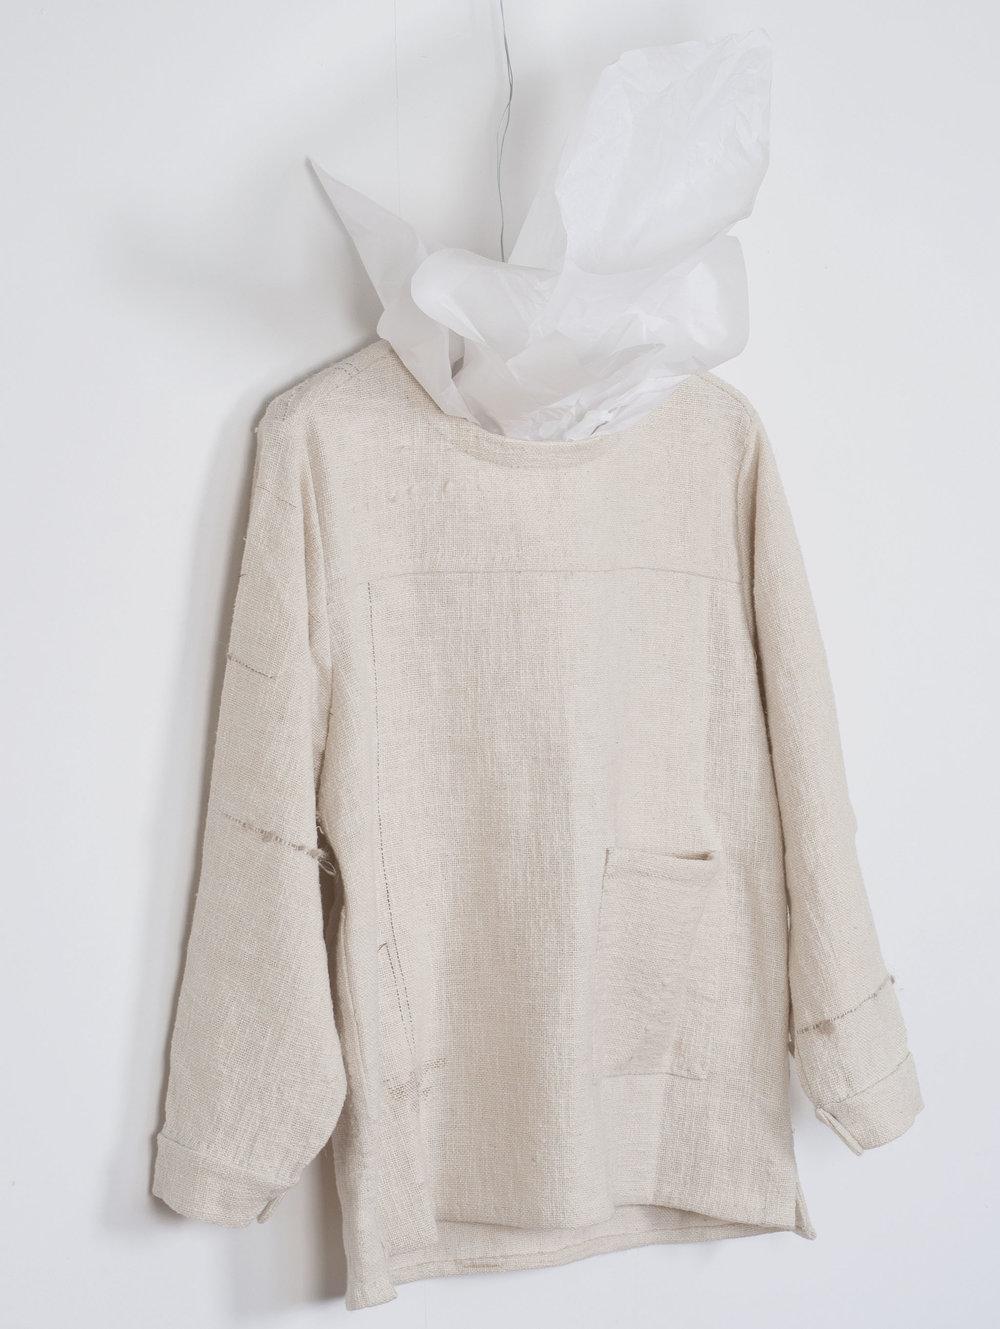 linen | wool | kakishibu tokkenshi [a]